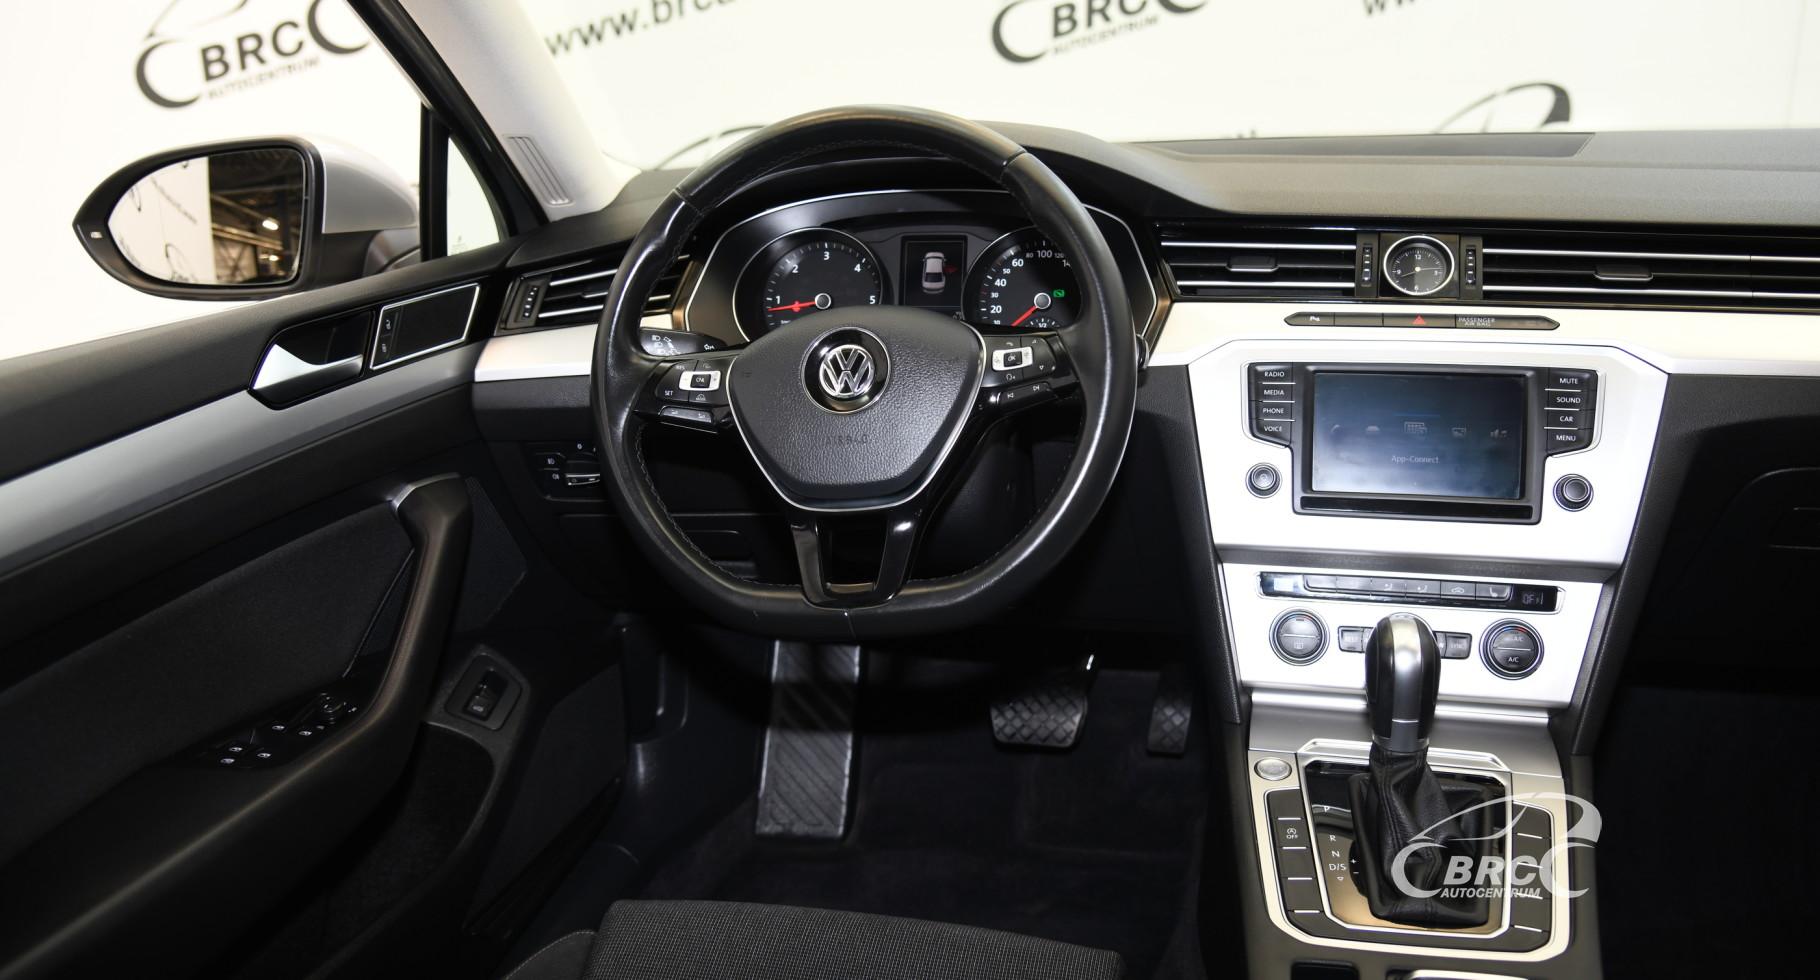 Volkswagen Passat 2.0 TDI DSG BlueMotion Automatas